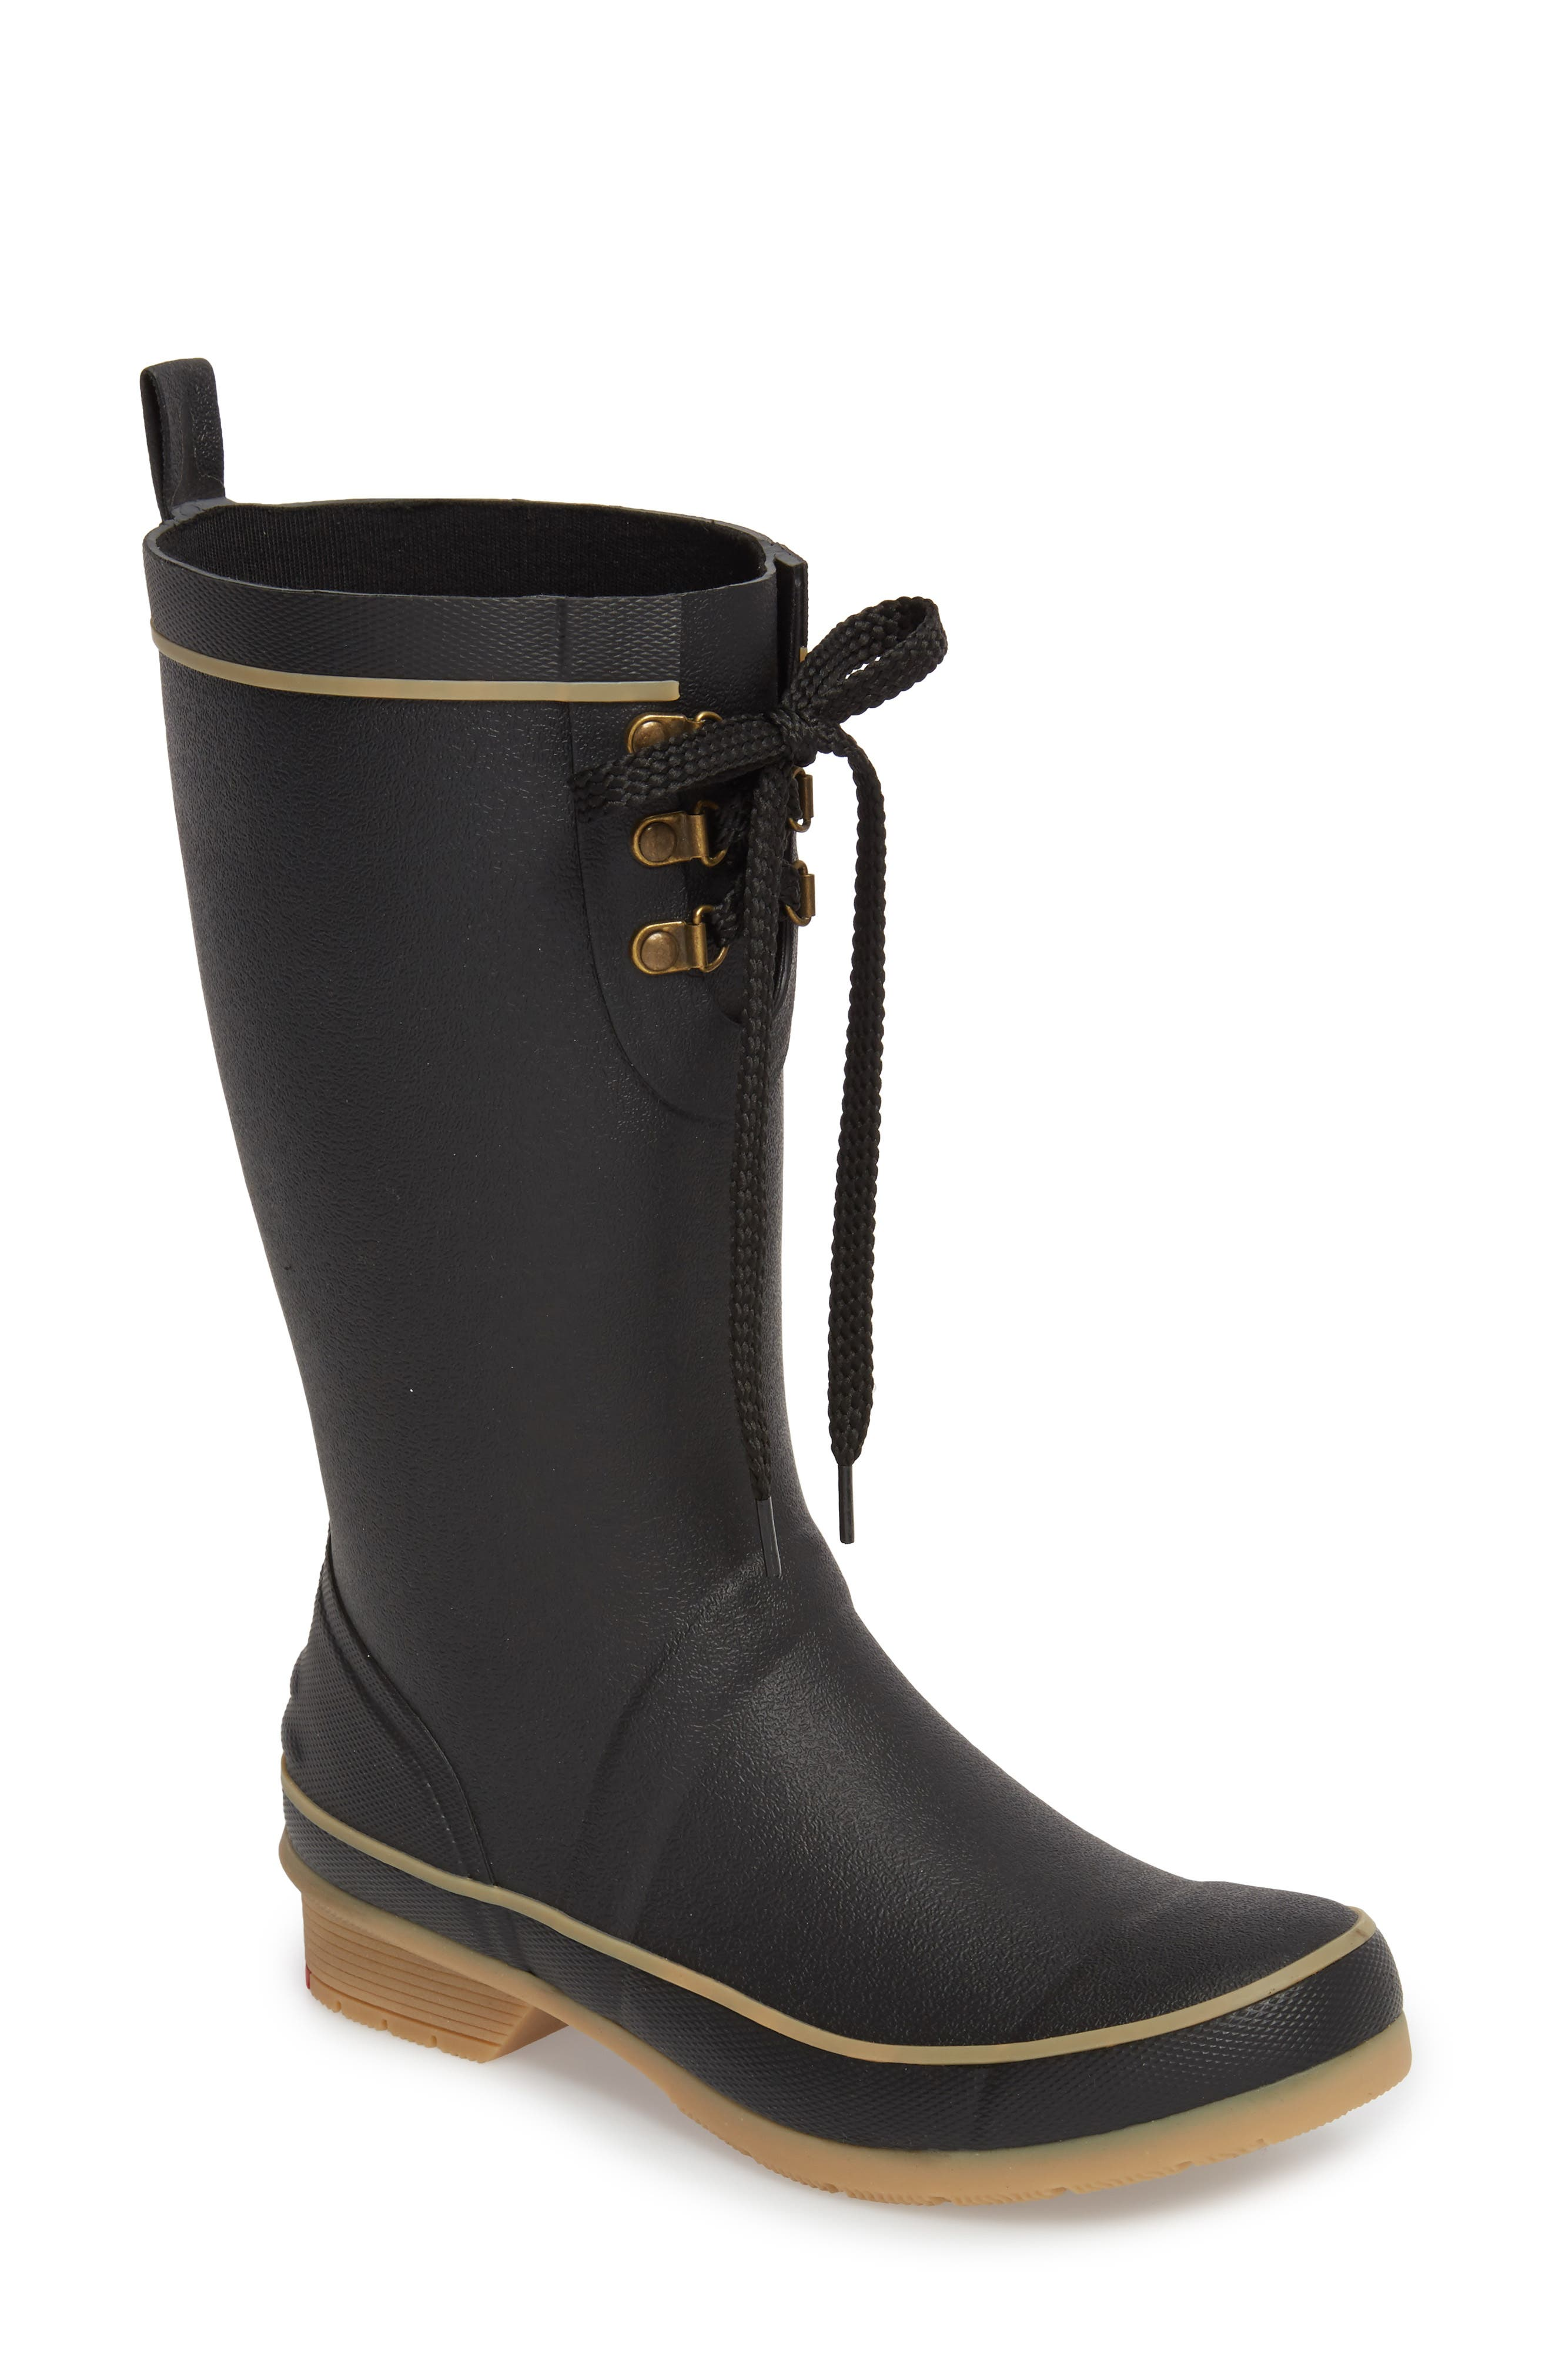 Womens Boots chooka black boot step in duck ym3h57i5